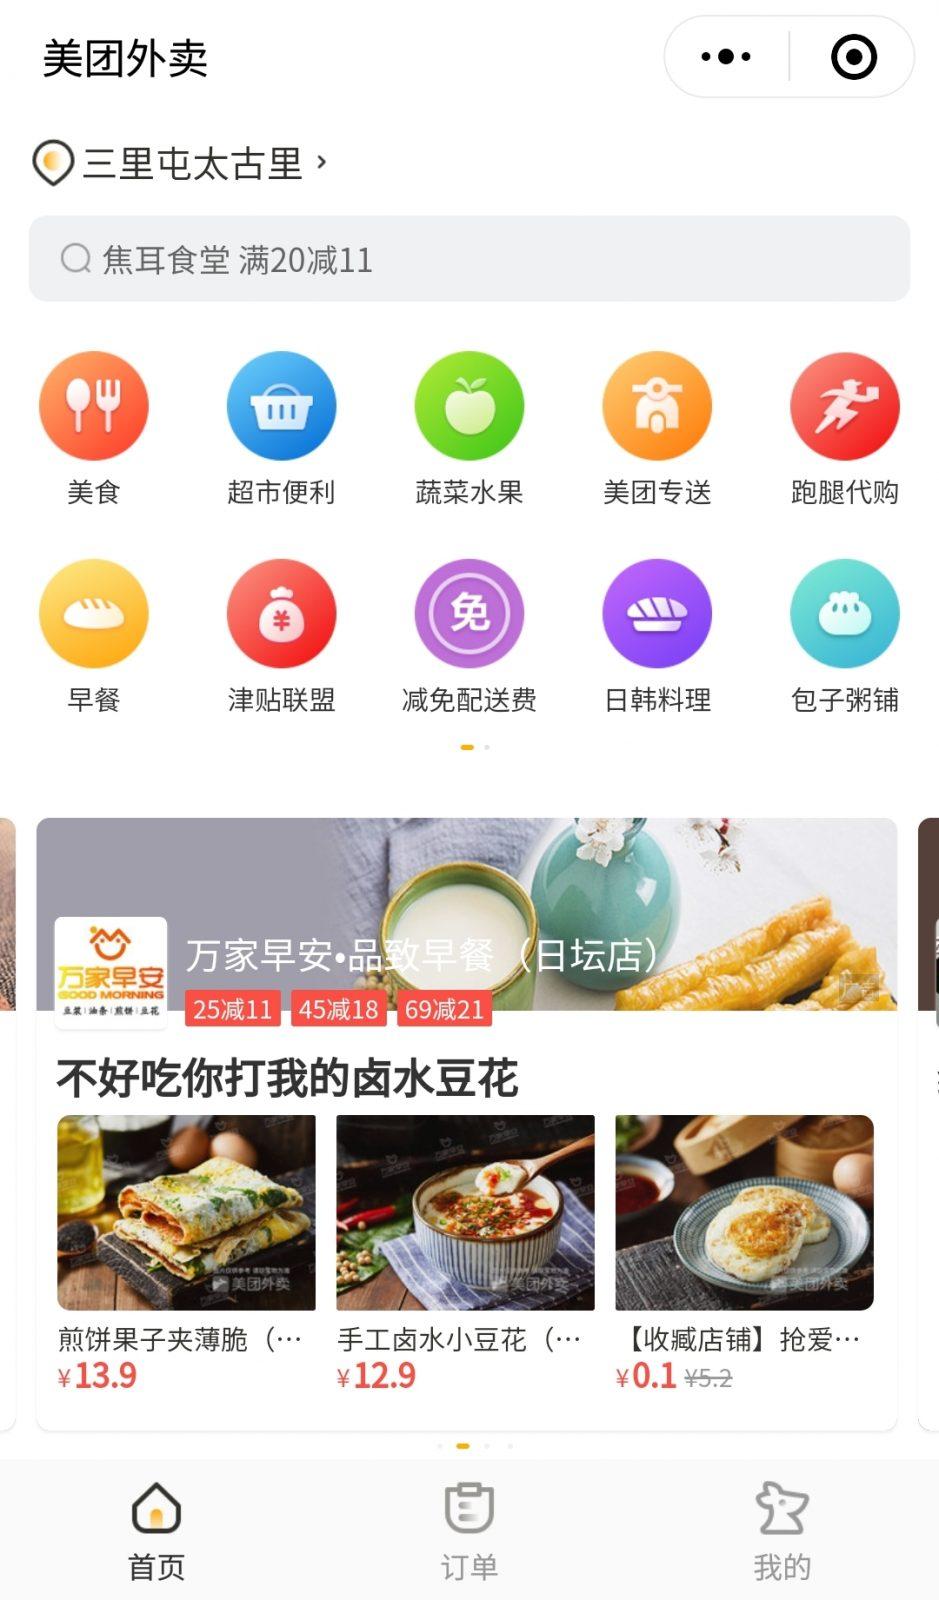 Meituan Waimai android ios wechat  美团外卖 按掉 苹果 微信